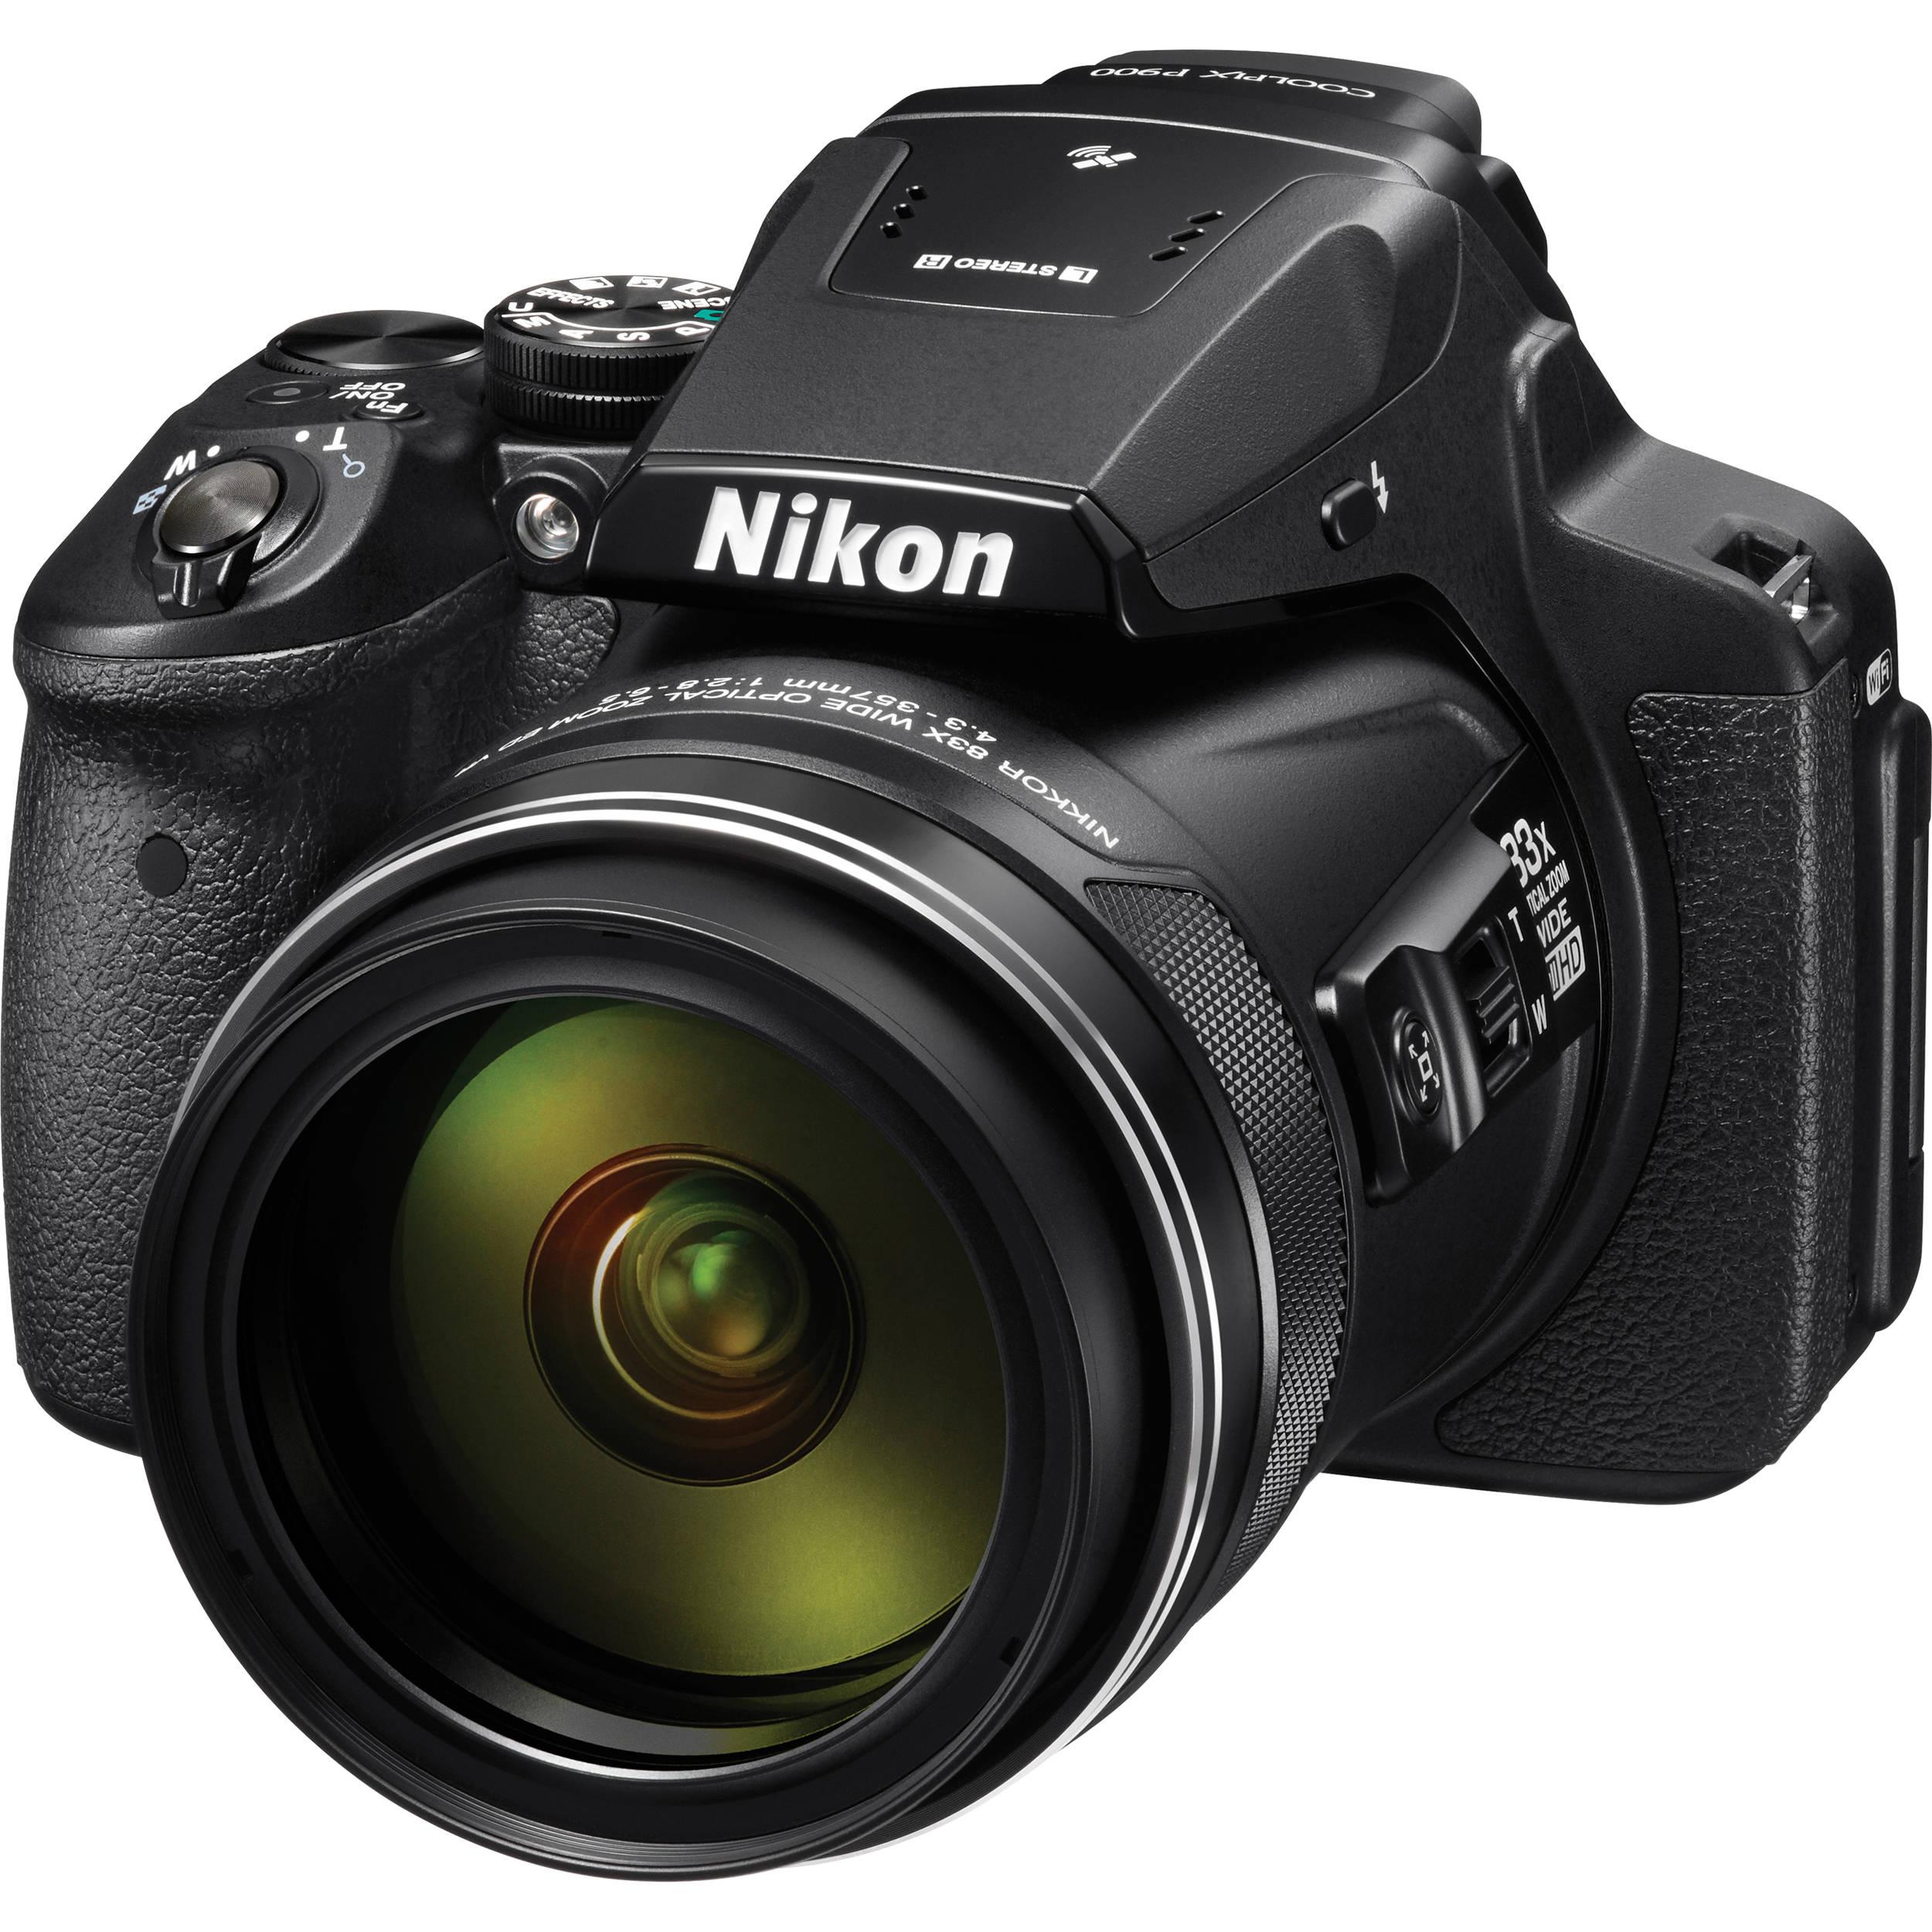 Nikon P900's 83x Optical Zoom Is Impressive